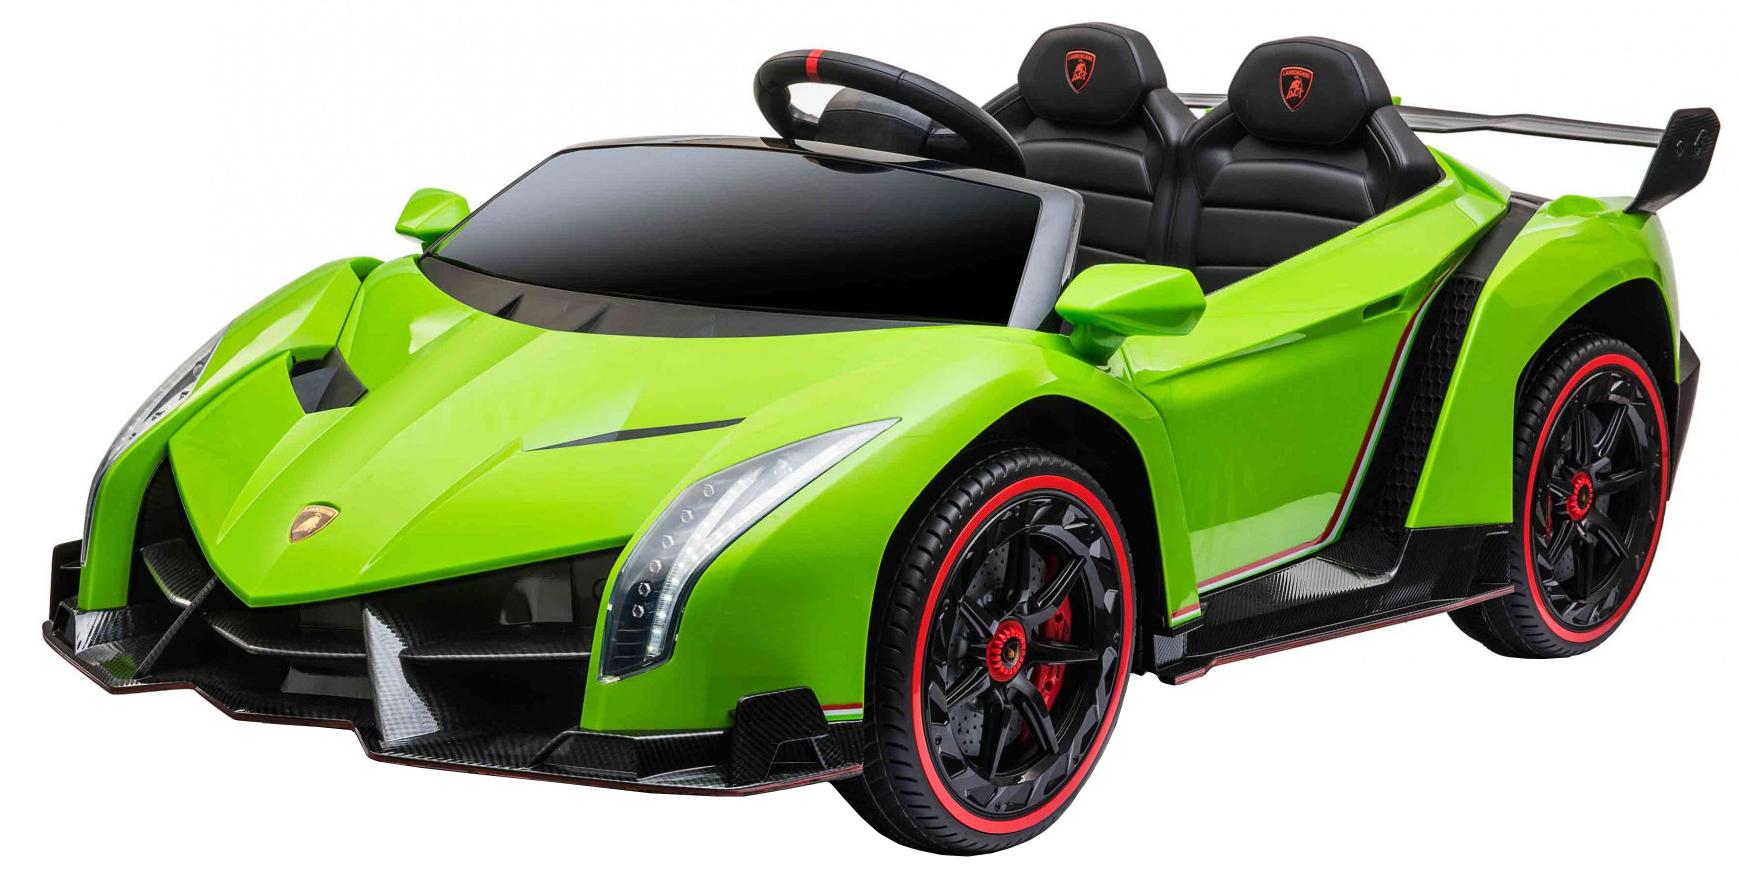 Masinuta electrica 4 x 4 Premier Lamborghini Veneno, 12V, roti cauciuc EVA, scaun piele ecologica, verde